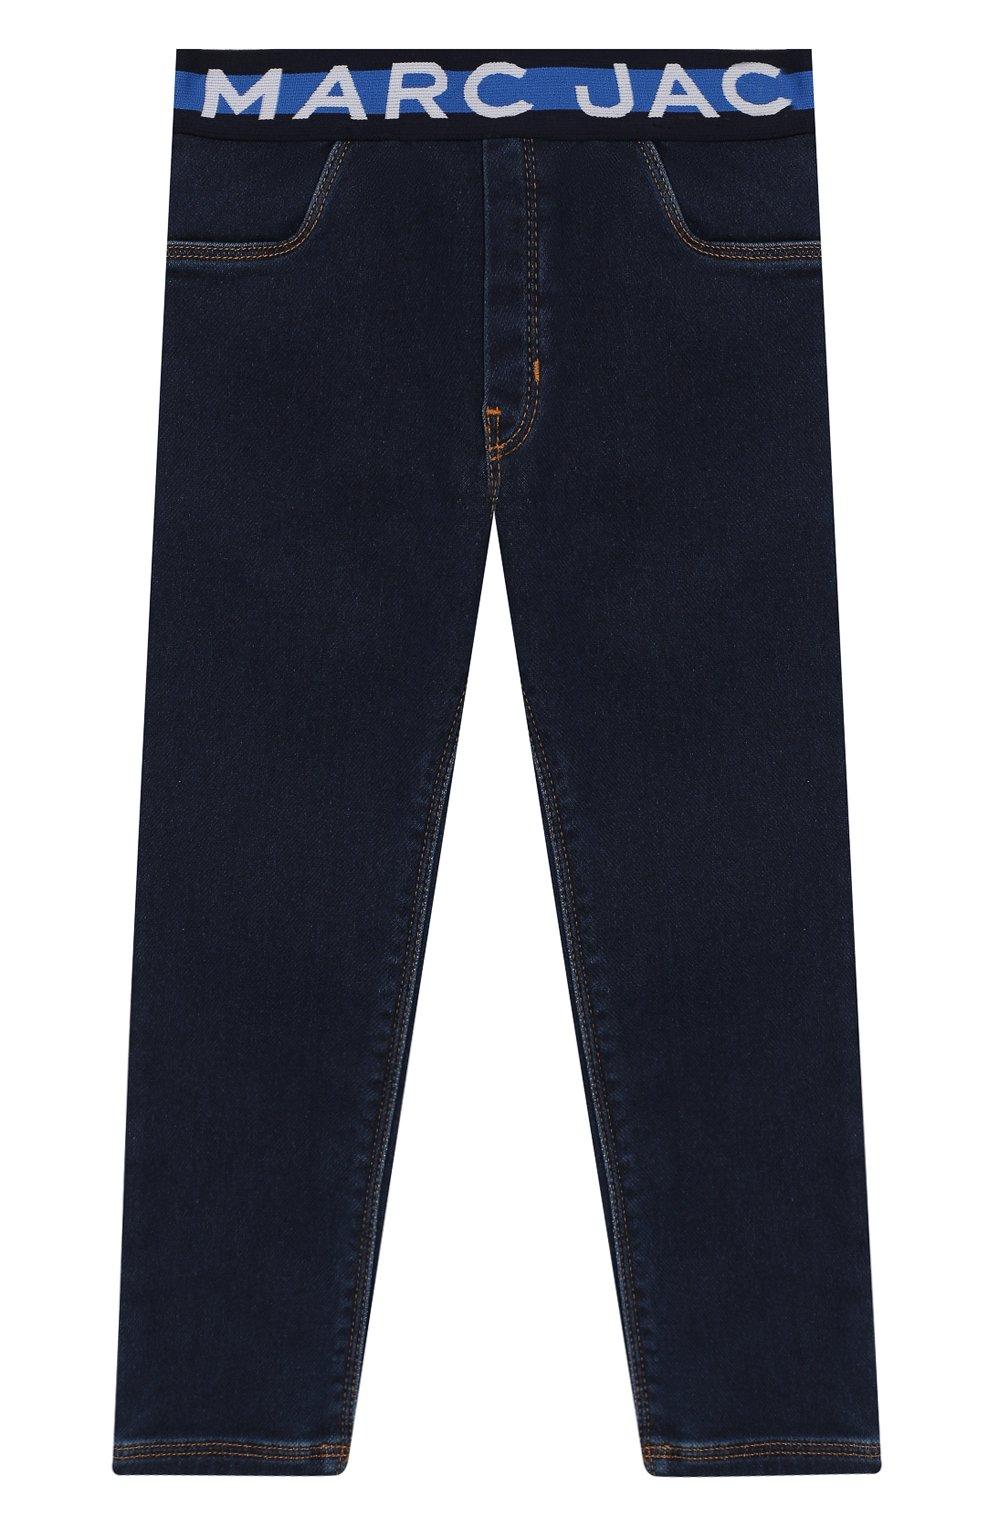 Детские джинсы MARC JACOBS (THE) темно-синего цвета, арт. W04168 | Фото 1